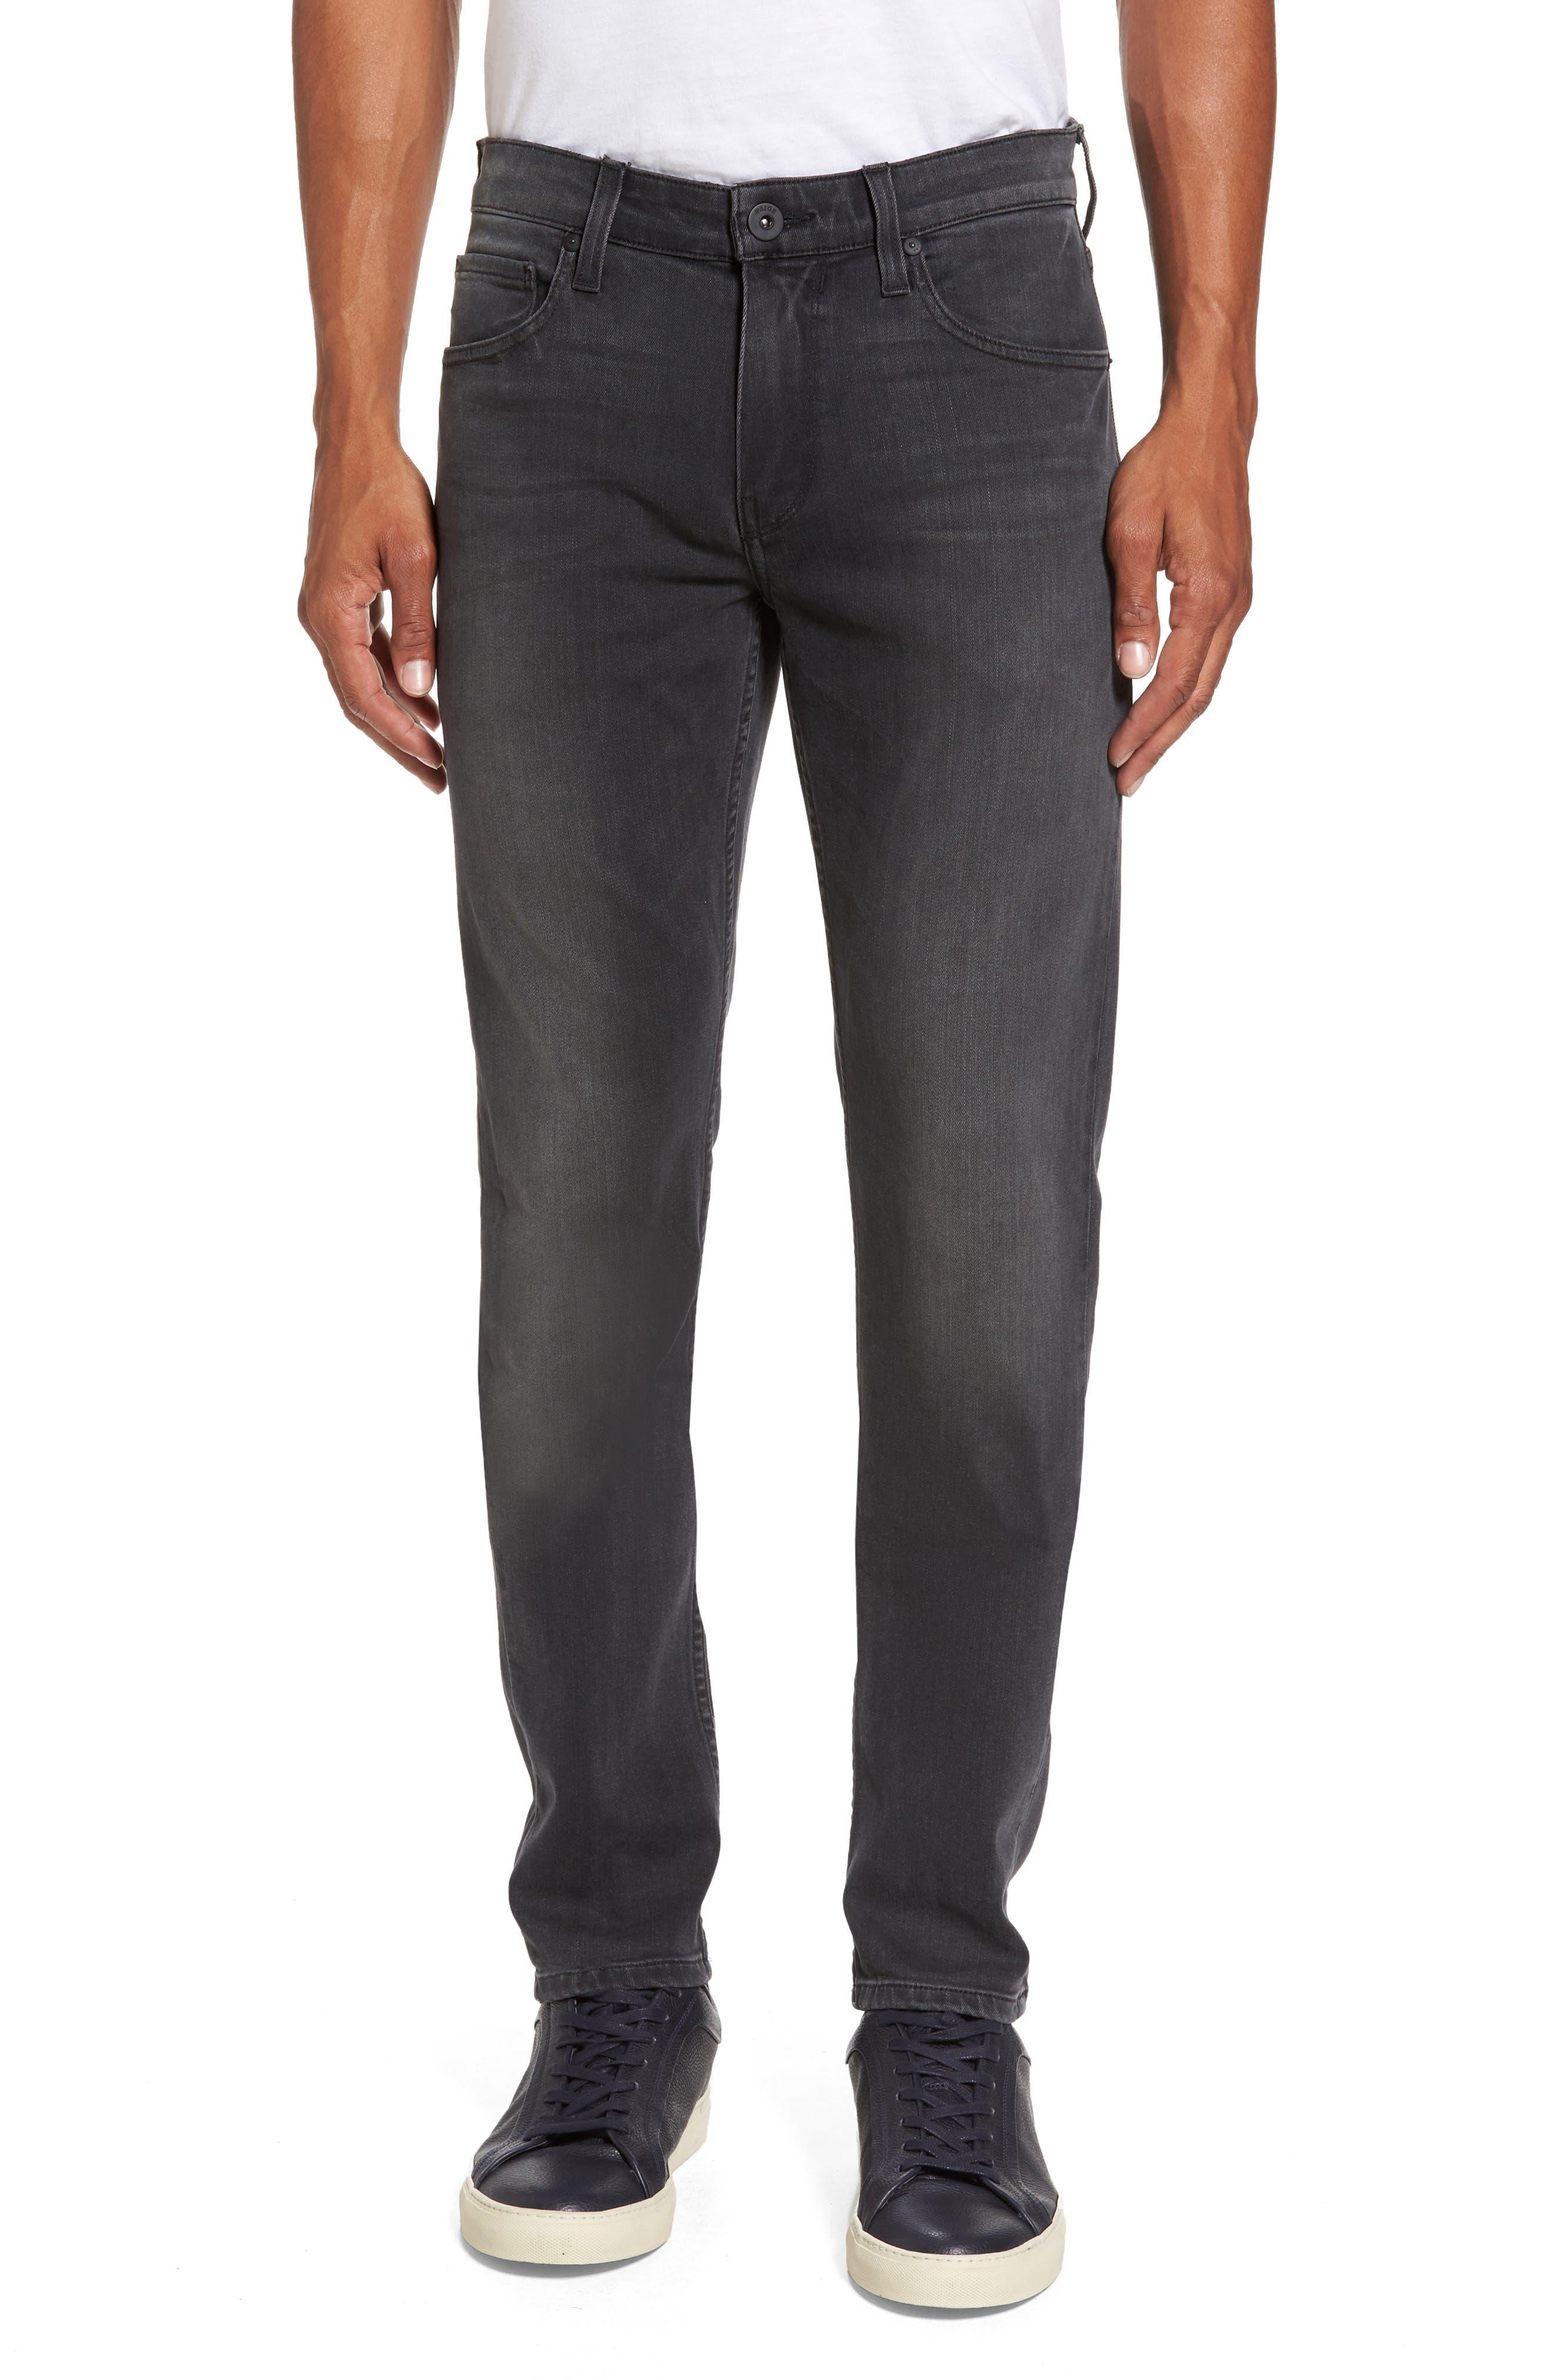 PAIGE Transcend - Croft Skinny Fit Jeans (Langdon)